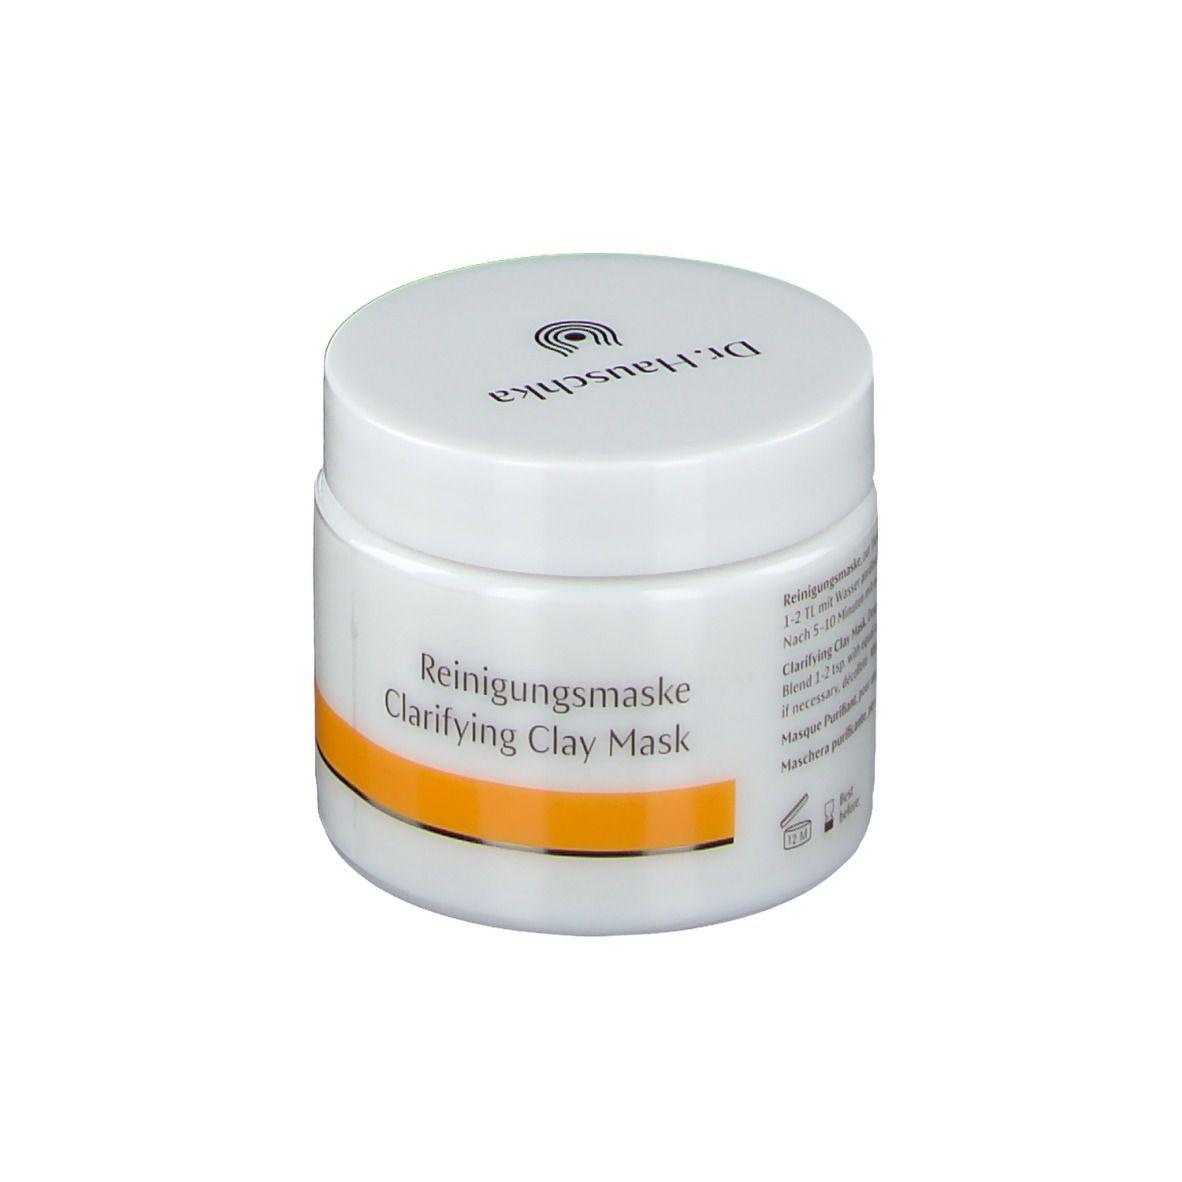 Dr. Hauschka® Reinigungsmaske Tiegel 90 g - shop-apotheke.com